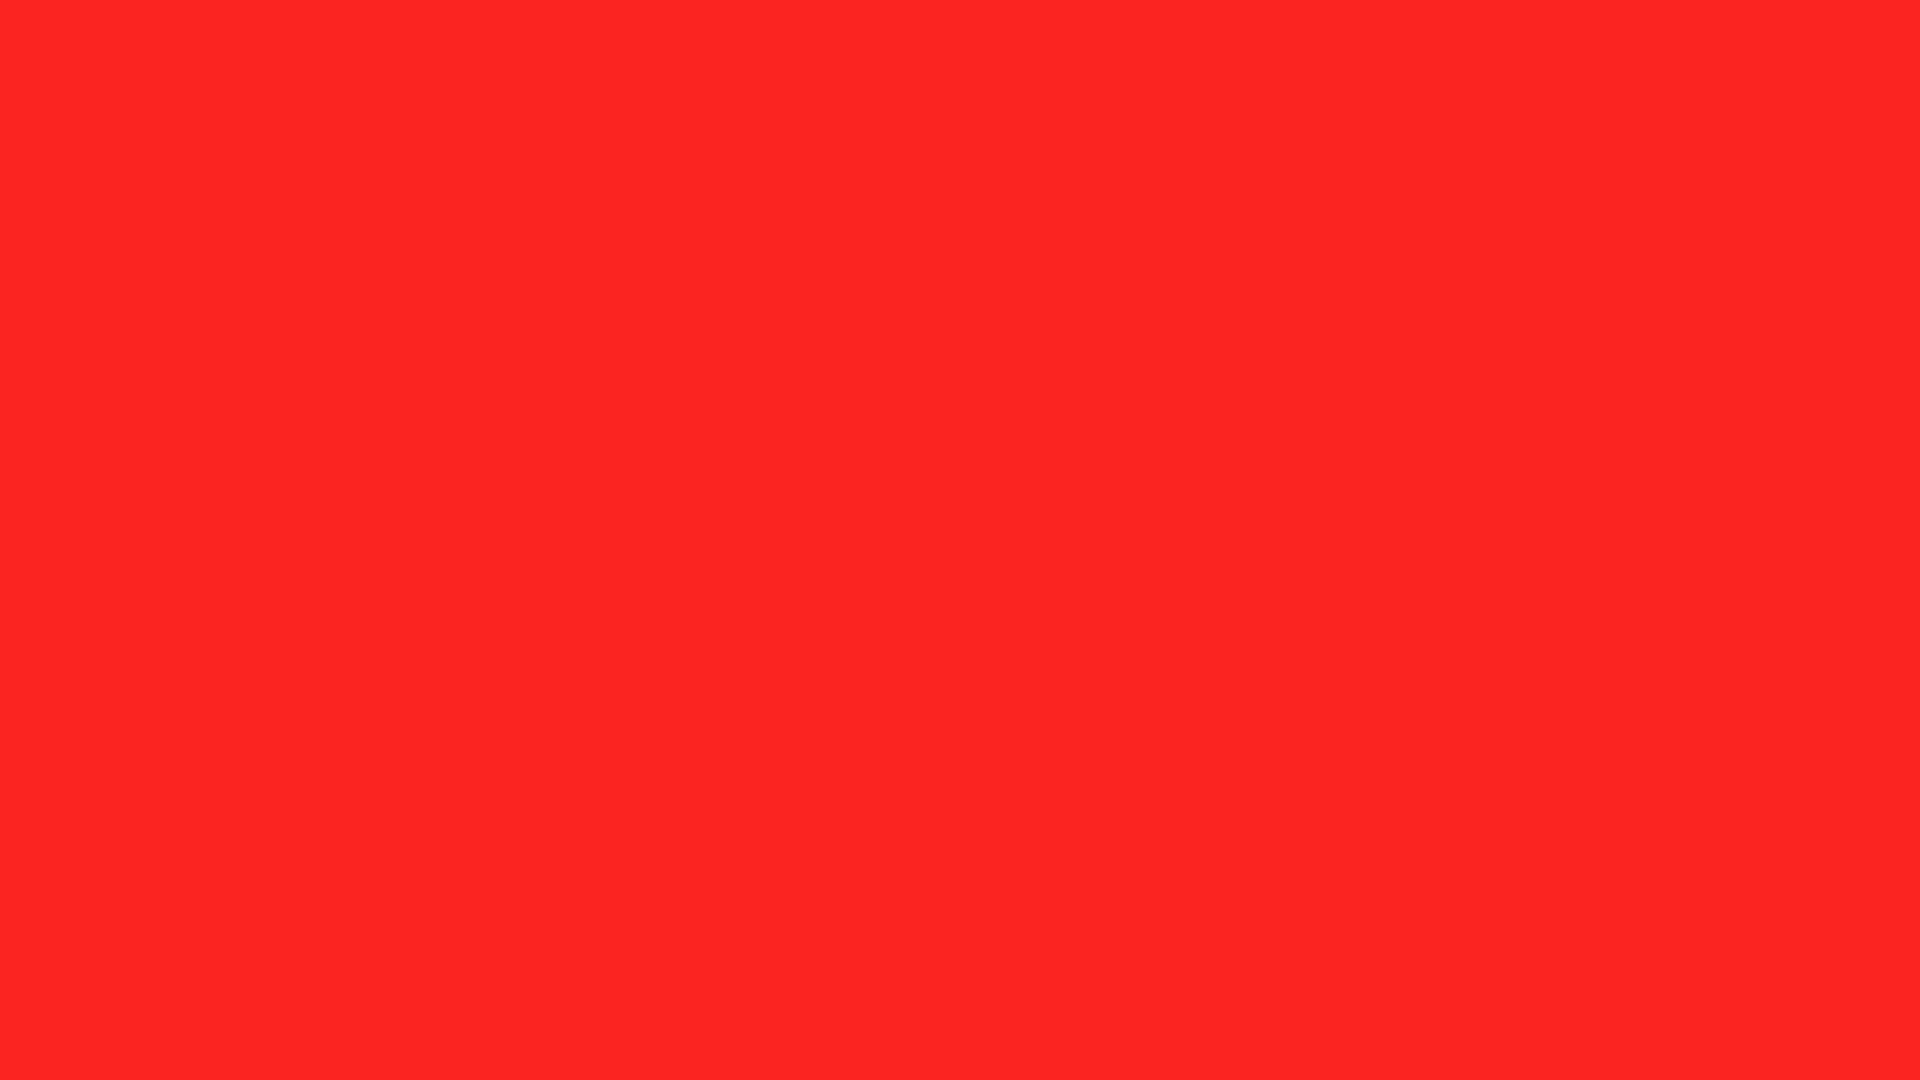 <span class='tit-hp-mj'></span><br><span class='tit-hp-mj'>ARTUSIjazz 2019</span><br><span class='tit-hp-mj' style='color:#ffffff;'>Foodstock</span></br>